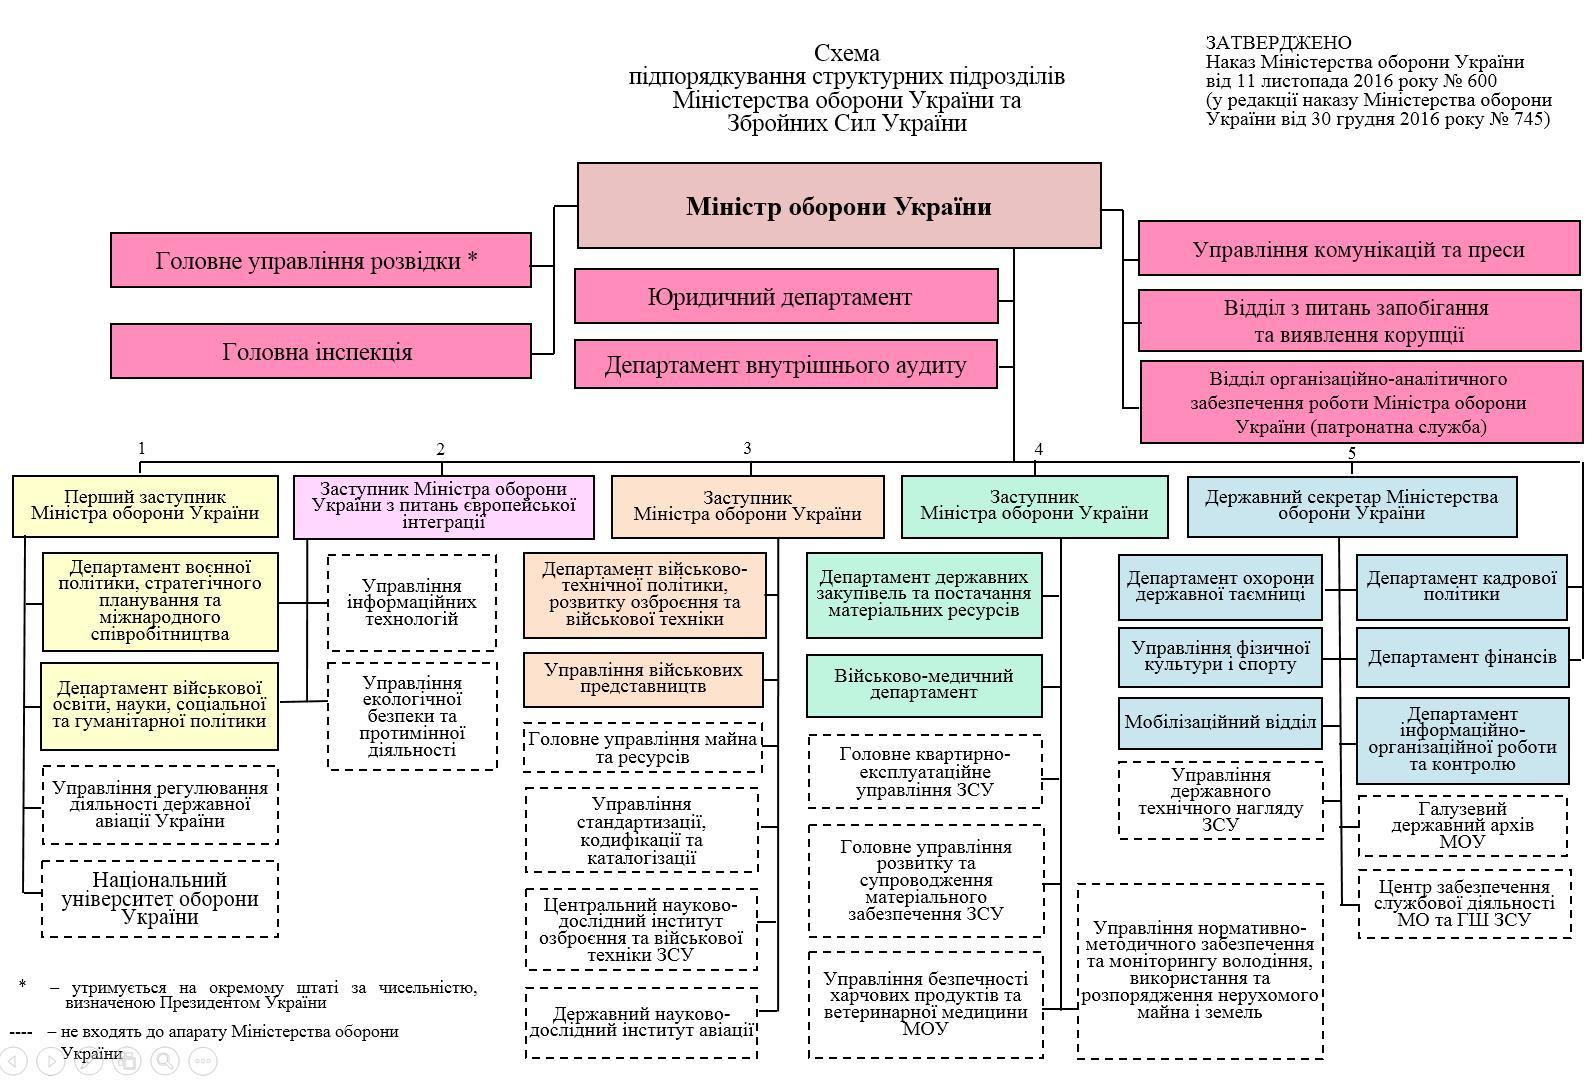 Структура Генерального штабу